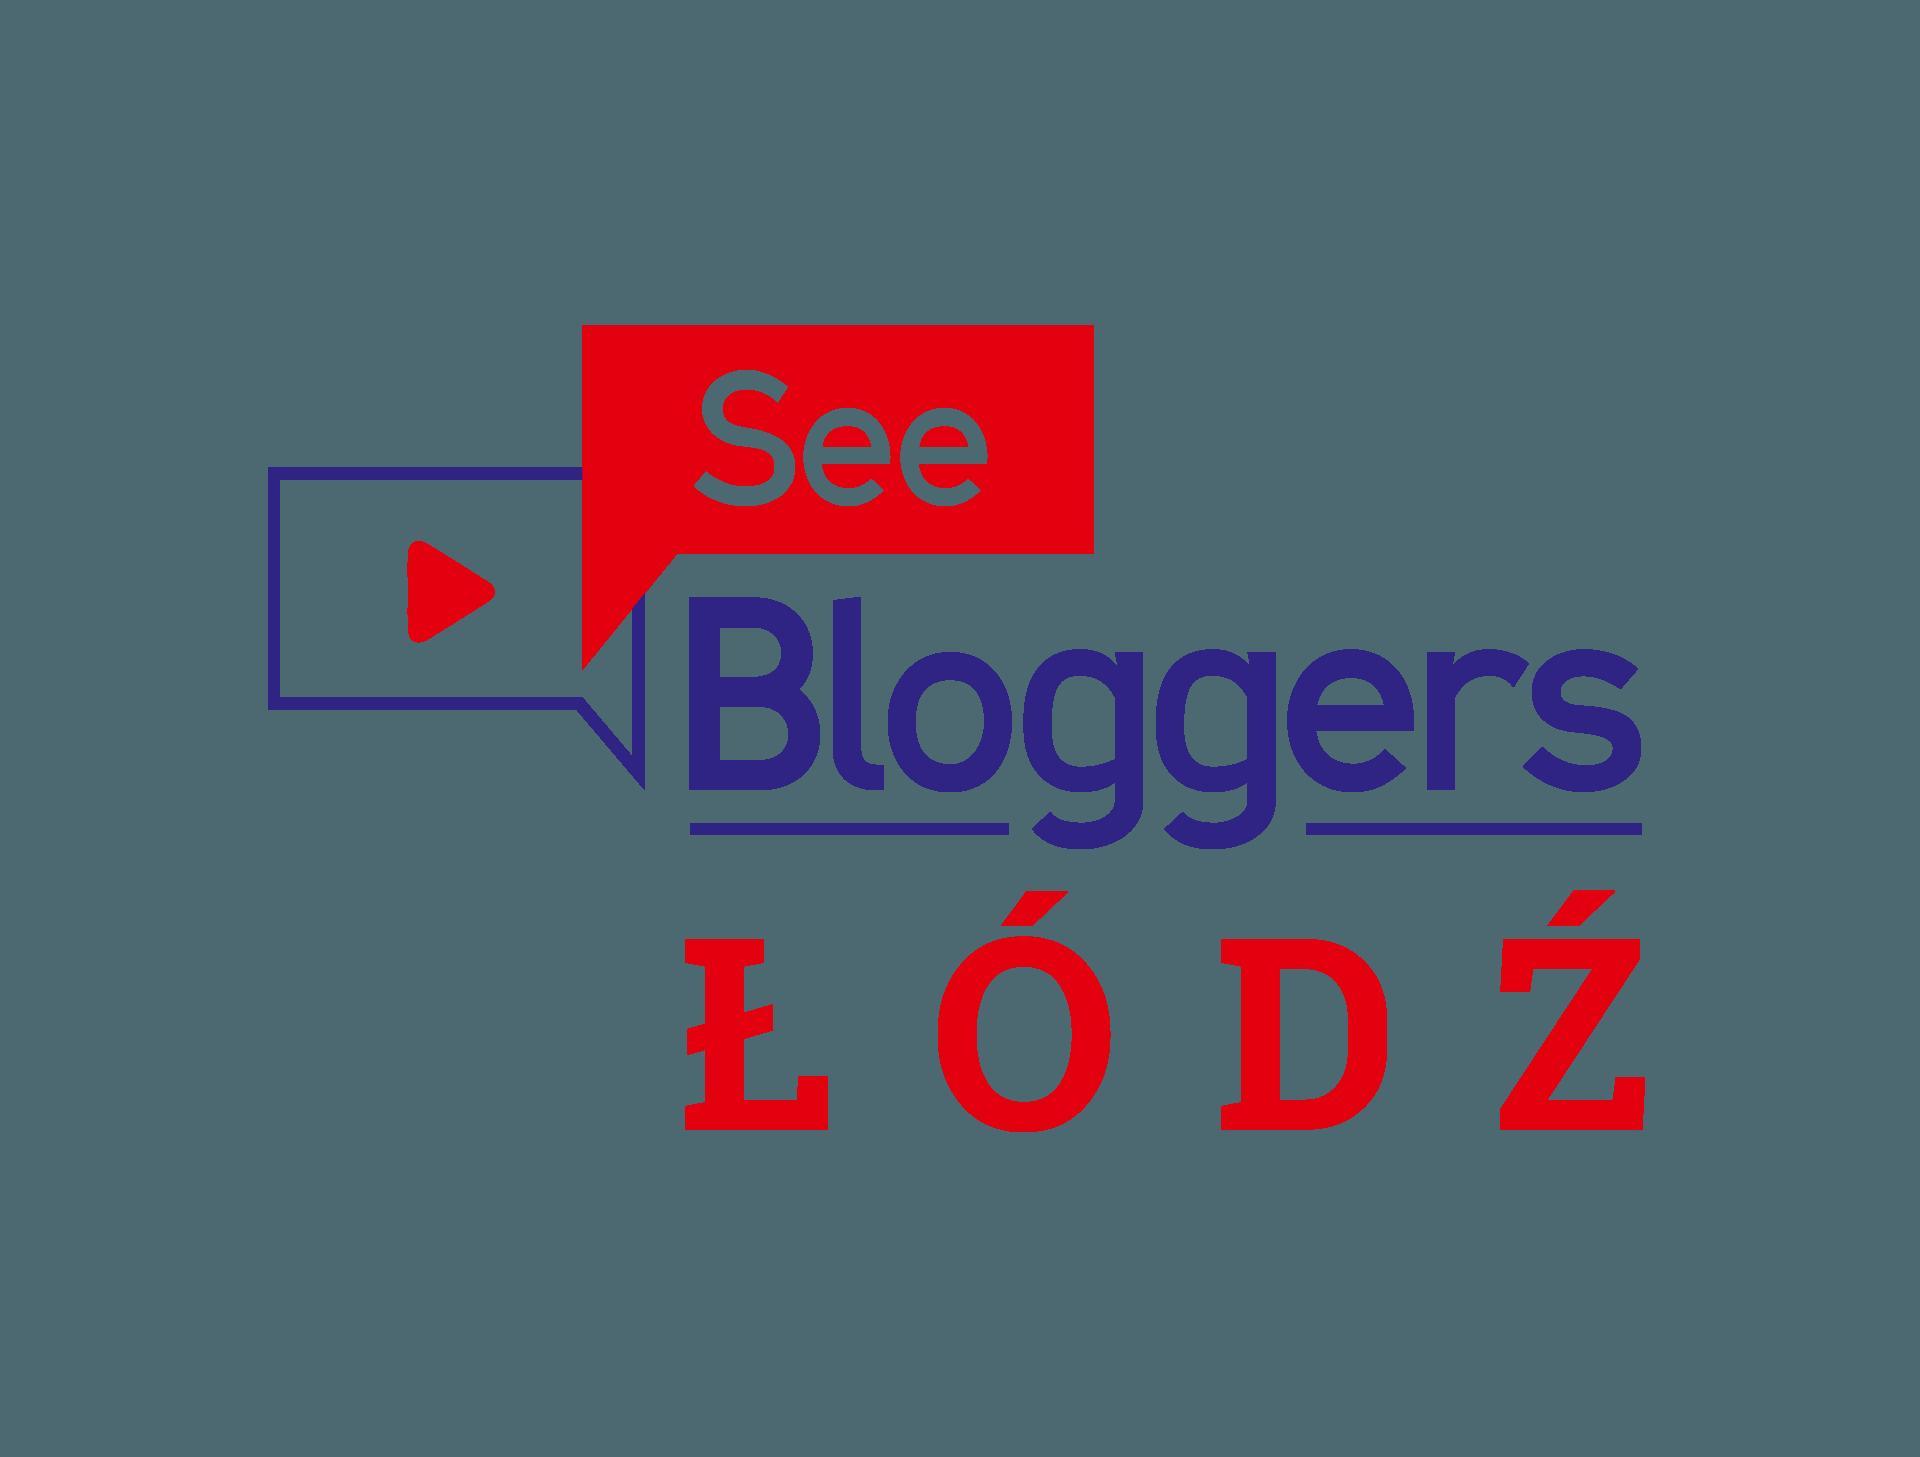 https://marketerplus.pl/wp-content/uploads/2018/04/seebloggerslodz_logo_black-1.png